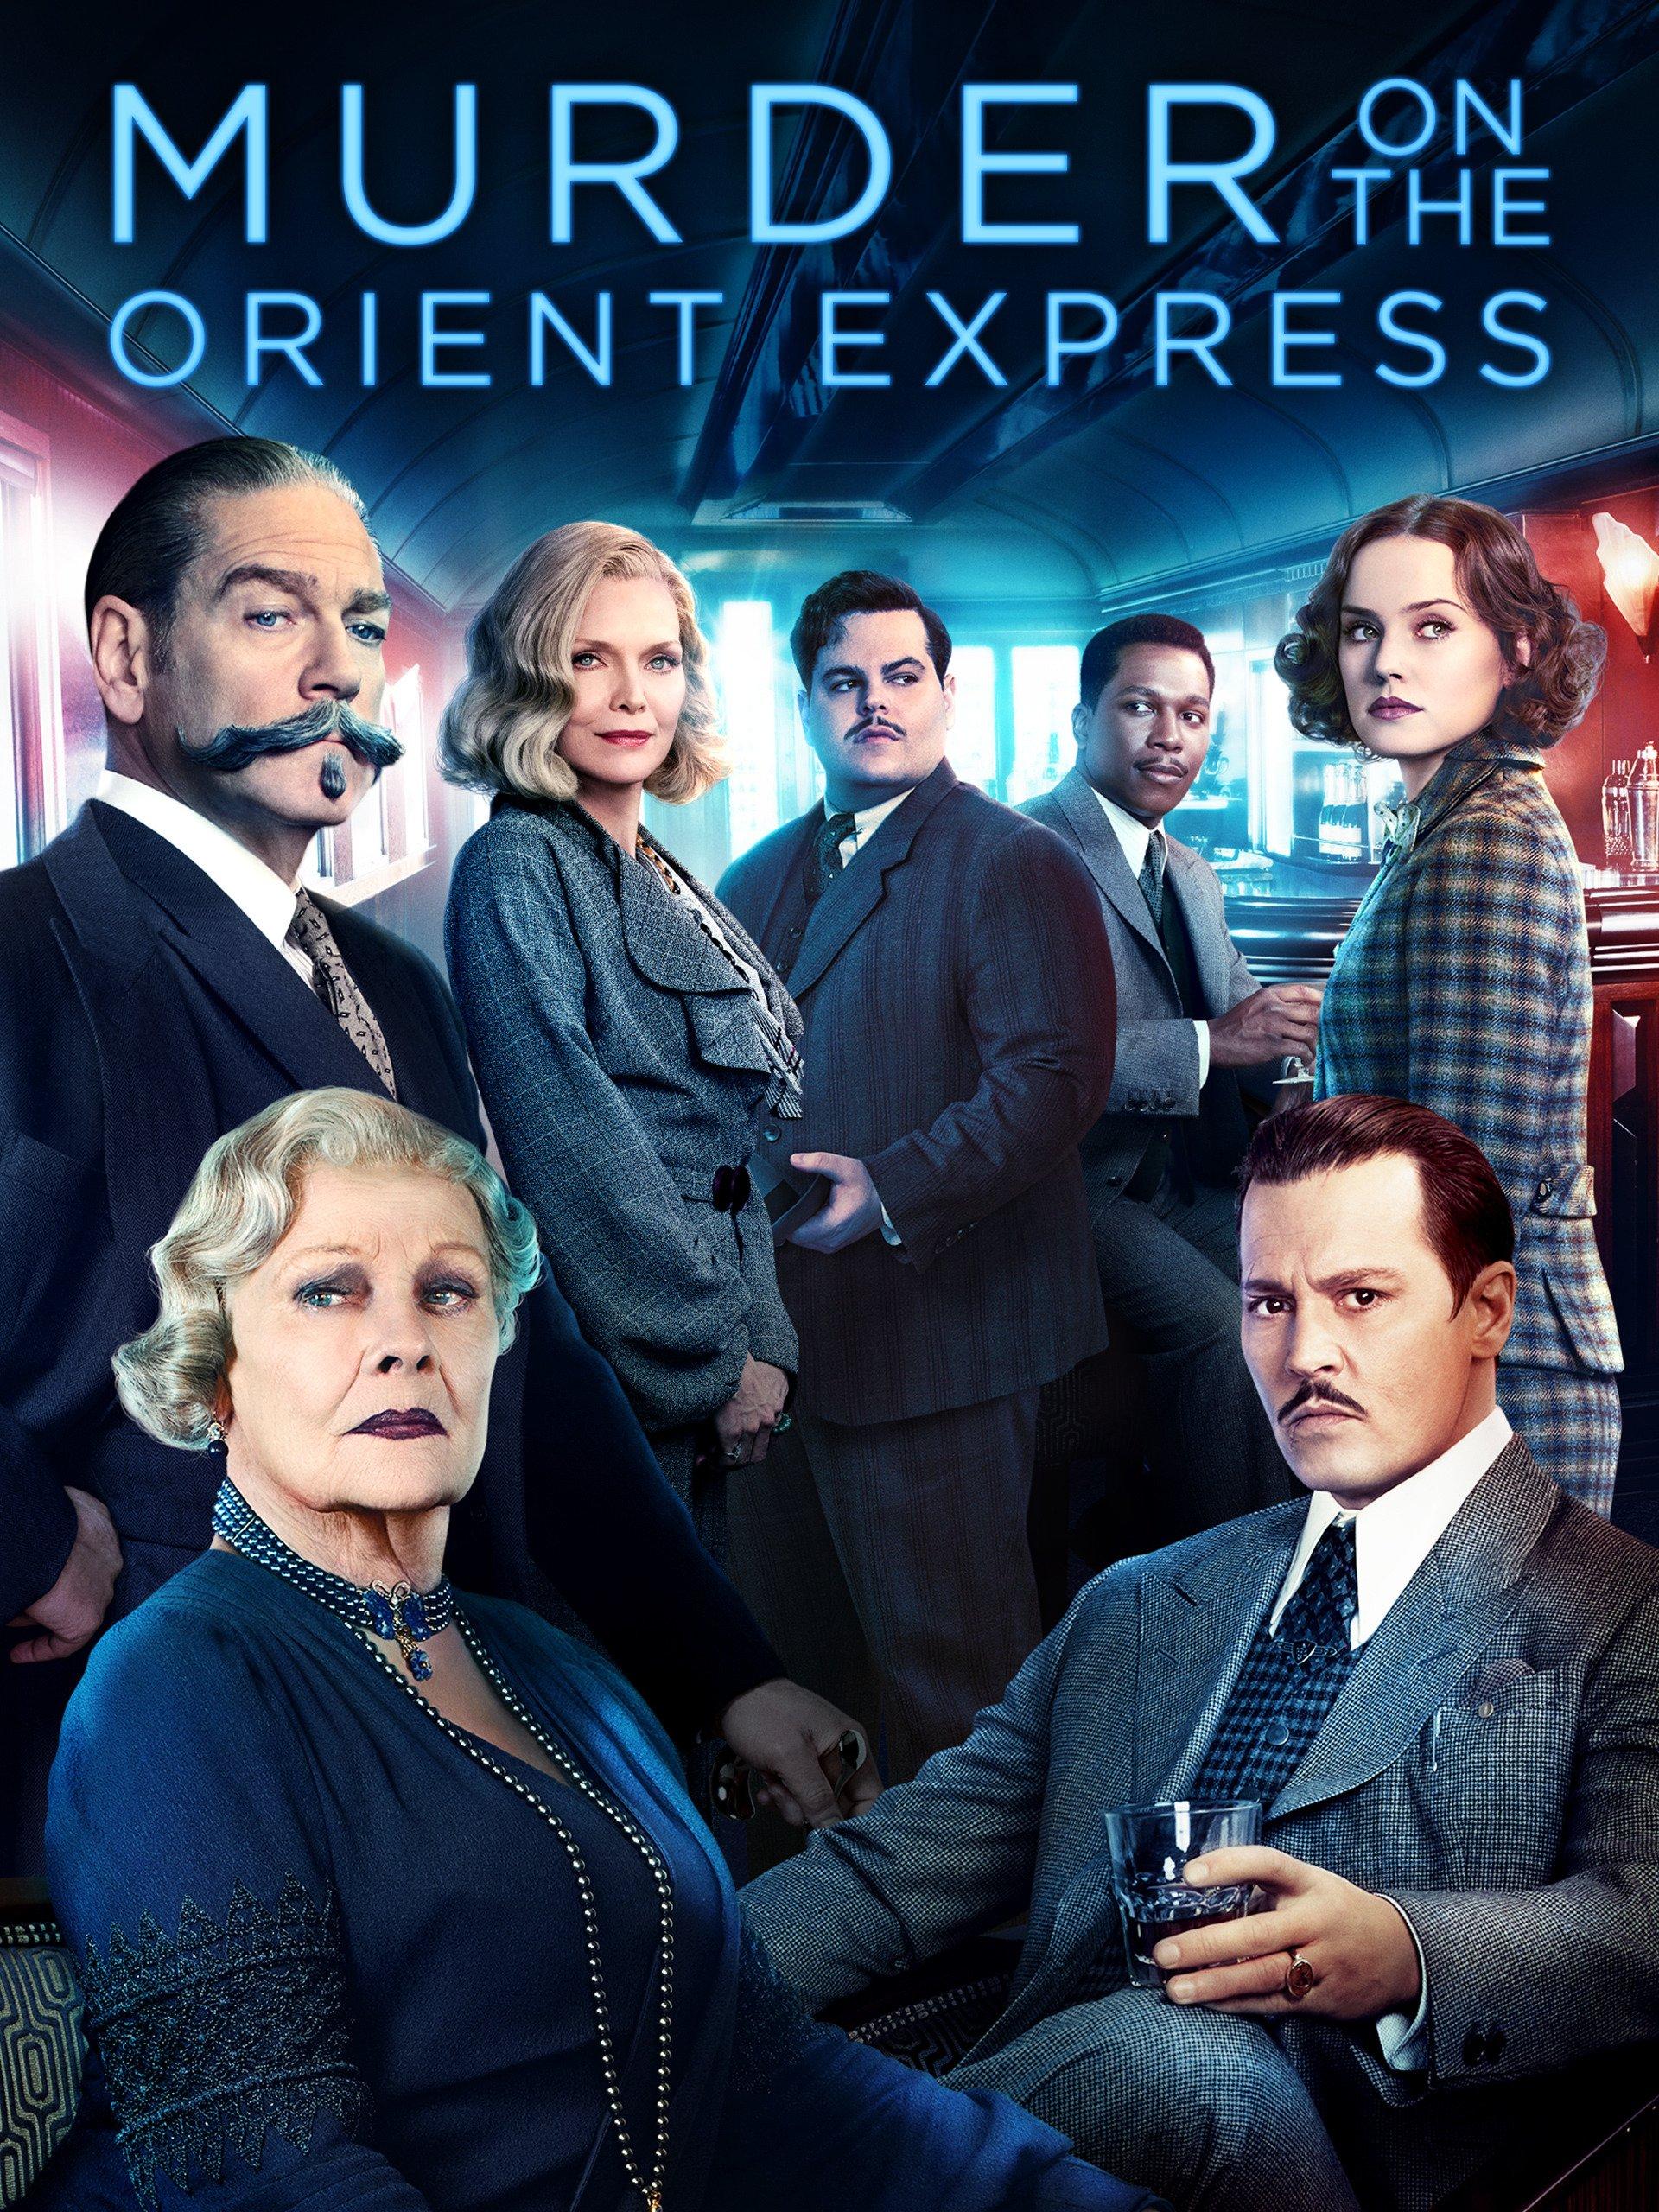 the butler movie free online